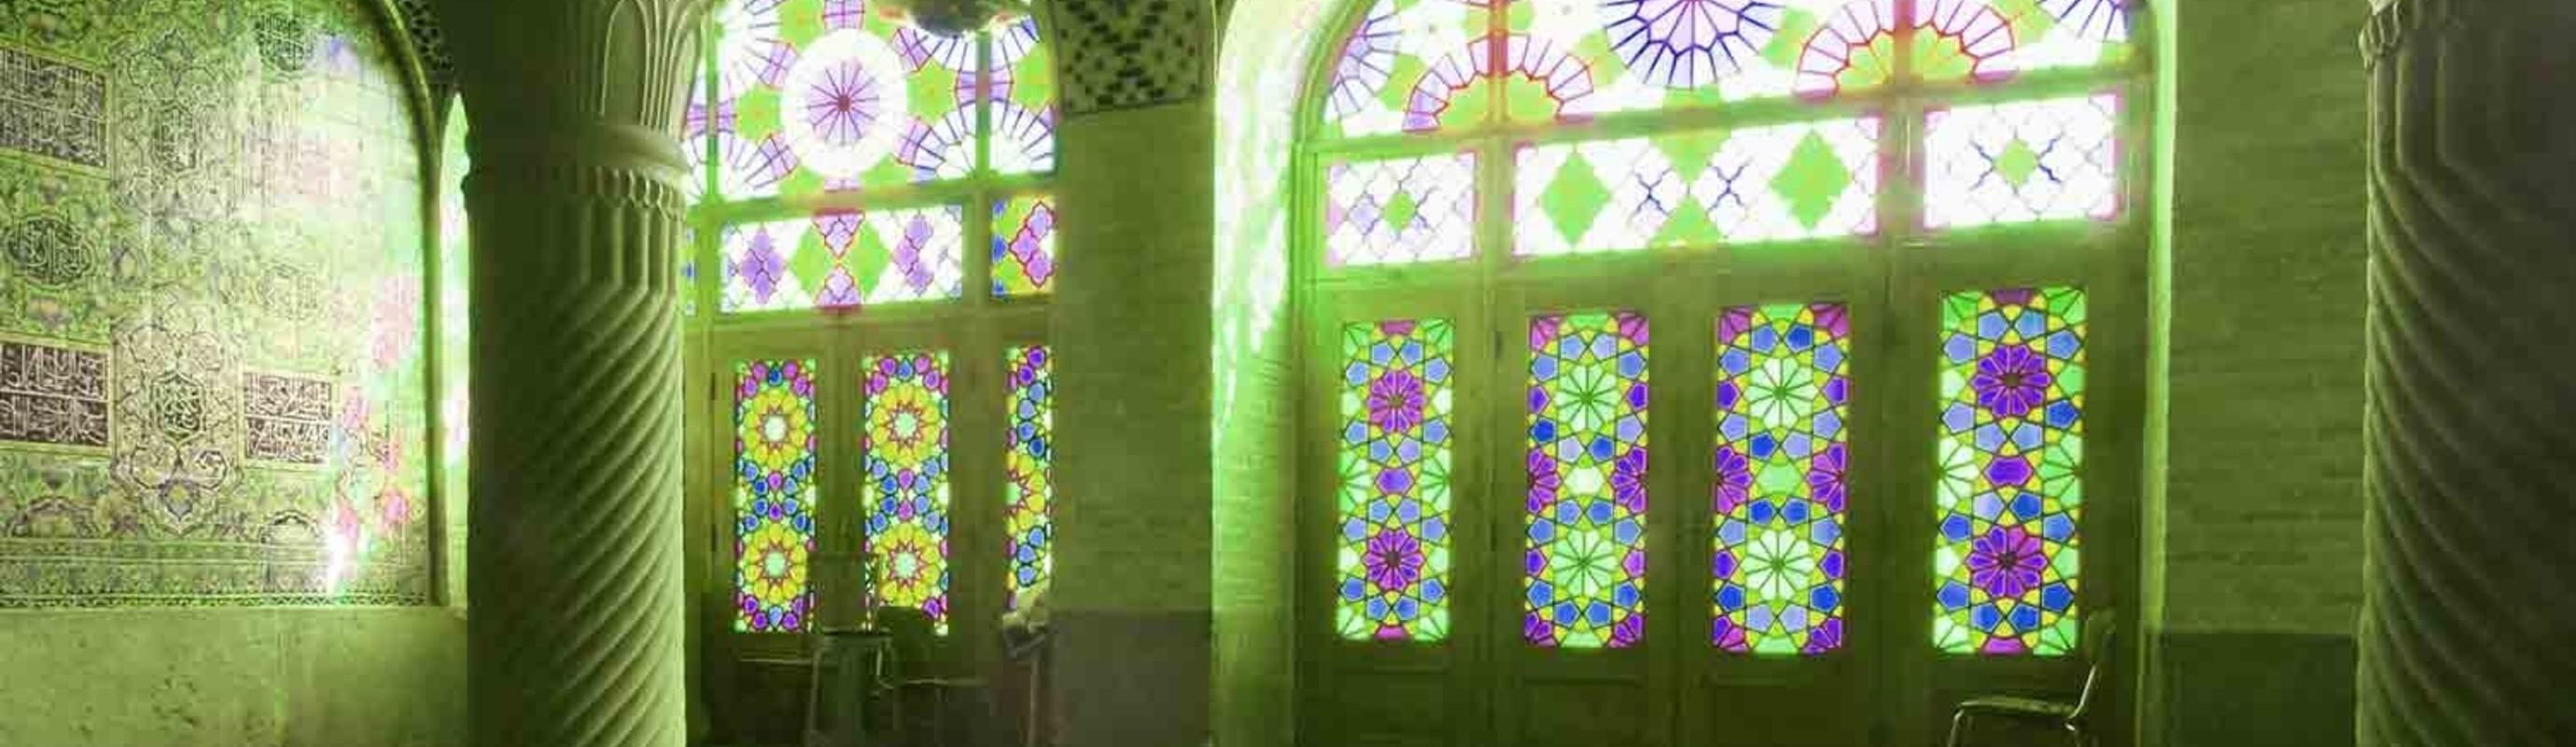 Catholic priests visiting Turk mosque.